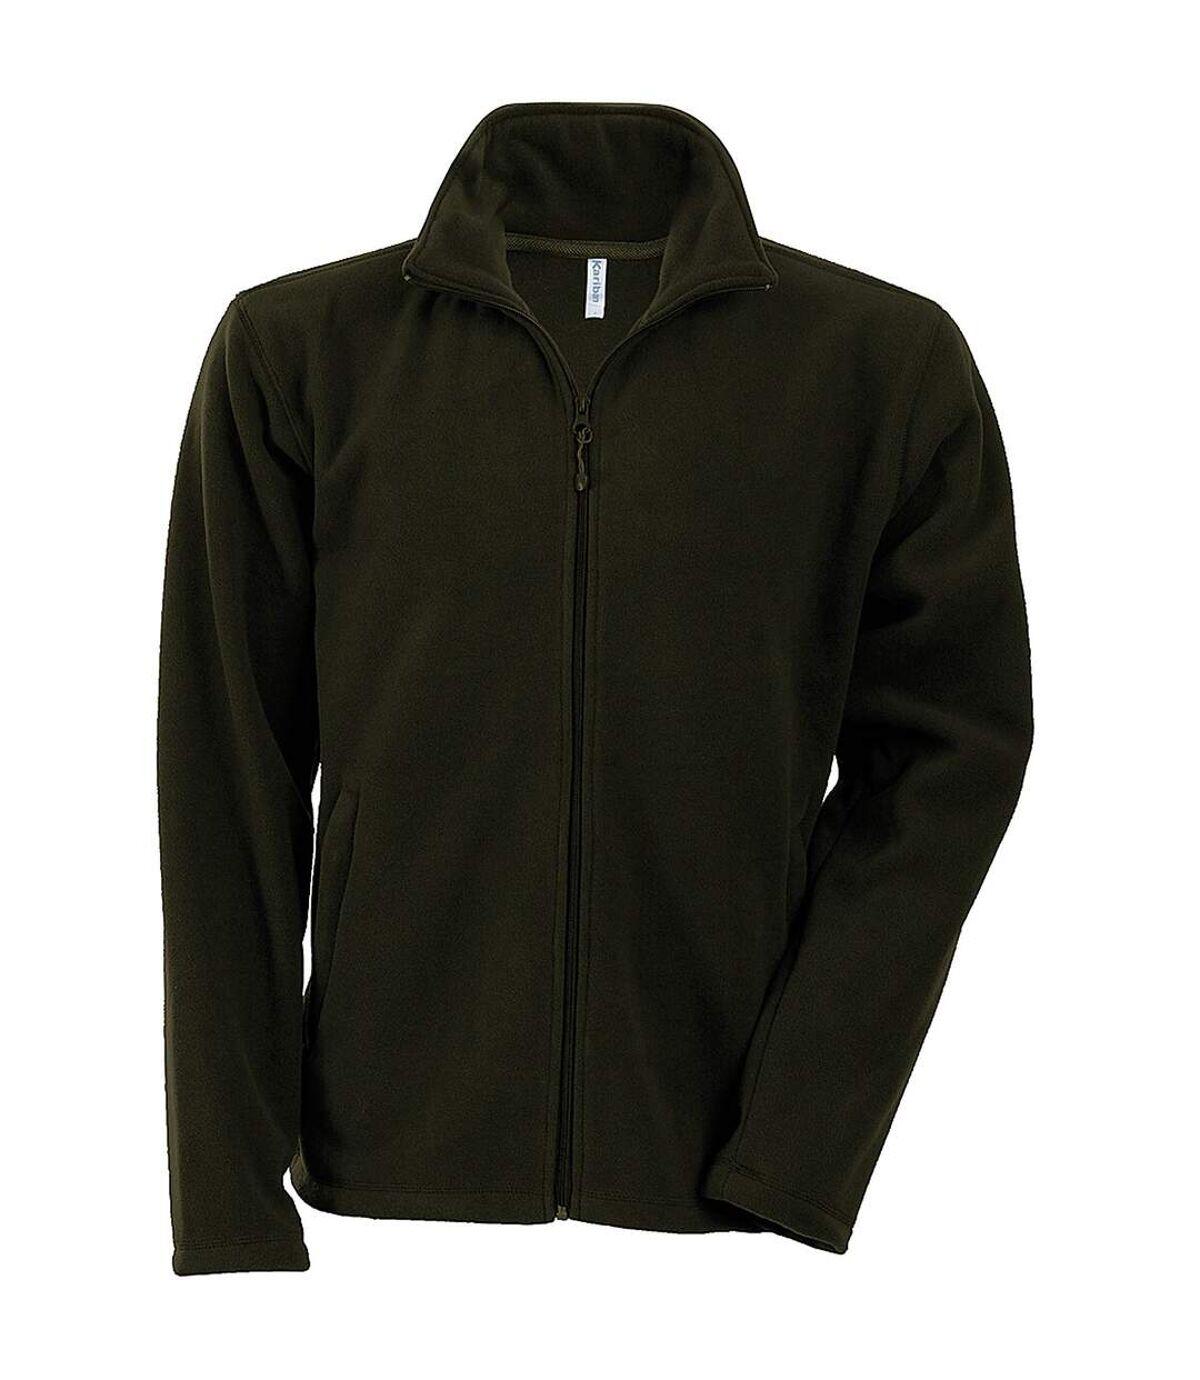 Kariban Mens Falco Full Zip Anti Pill Fleece Jacket (Olive) - UTRW737